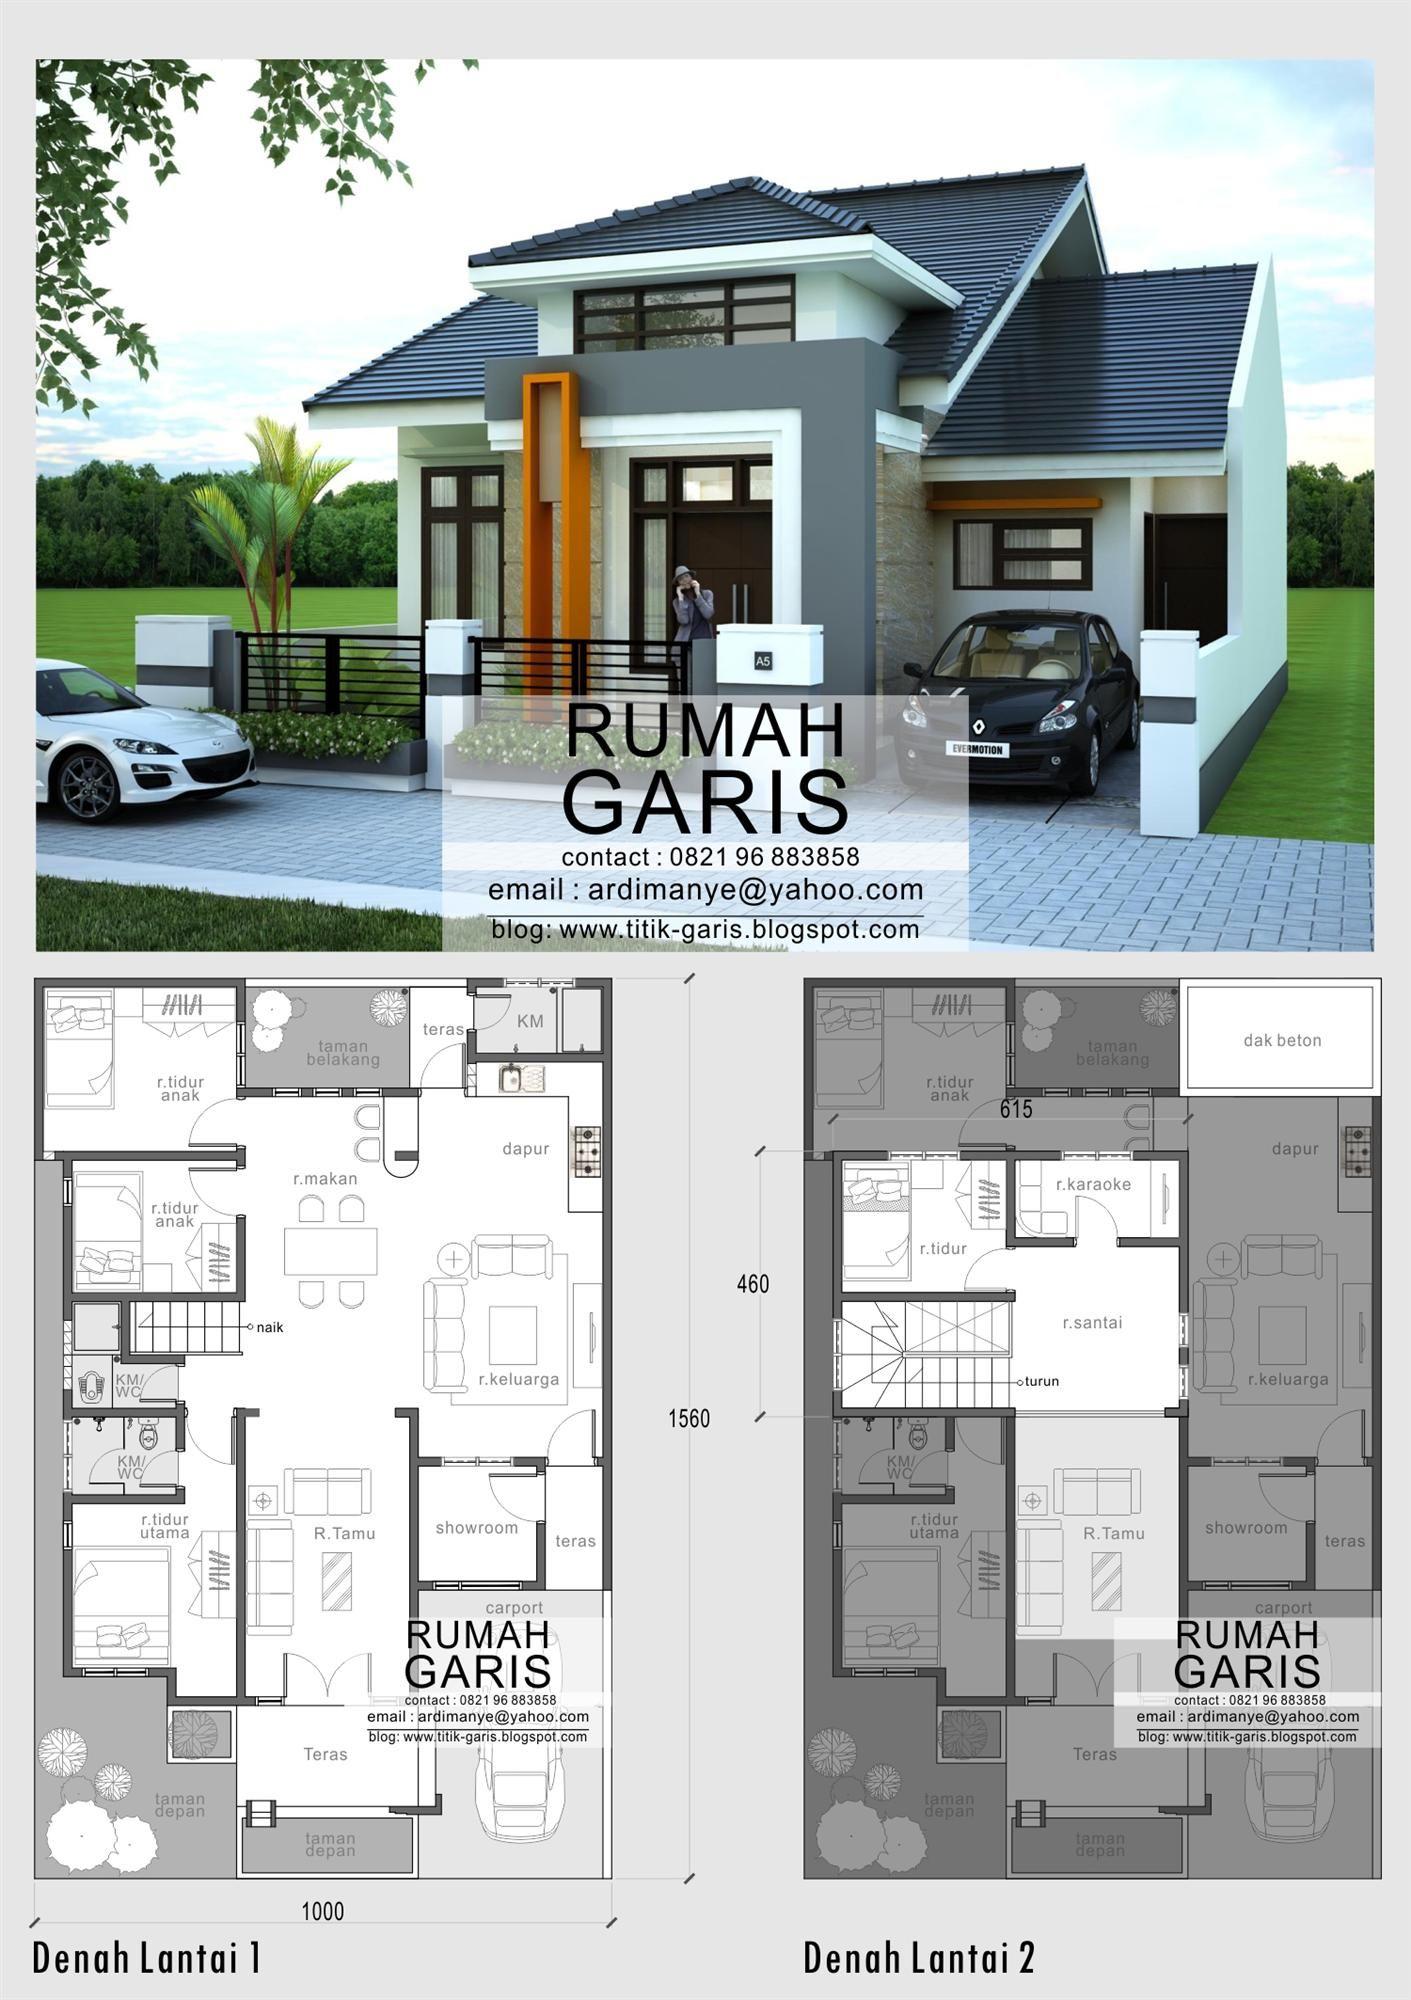 Desain Rumah Minimalis Modern 1 Lantai 3 Kamar